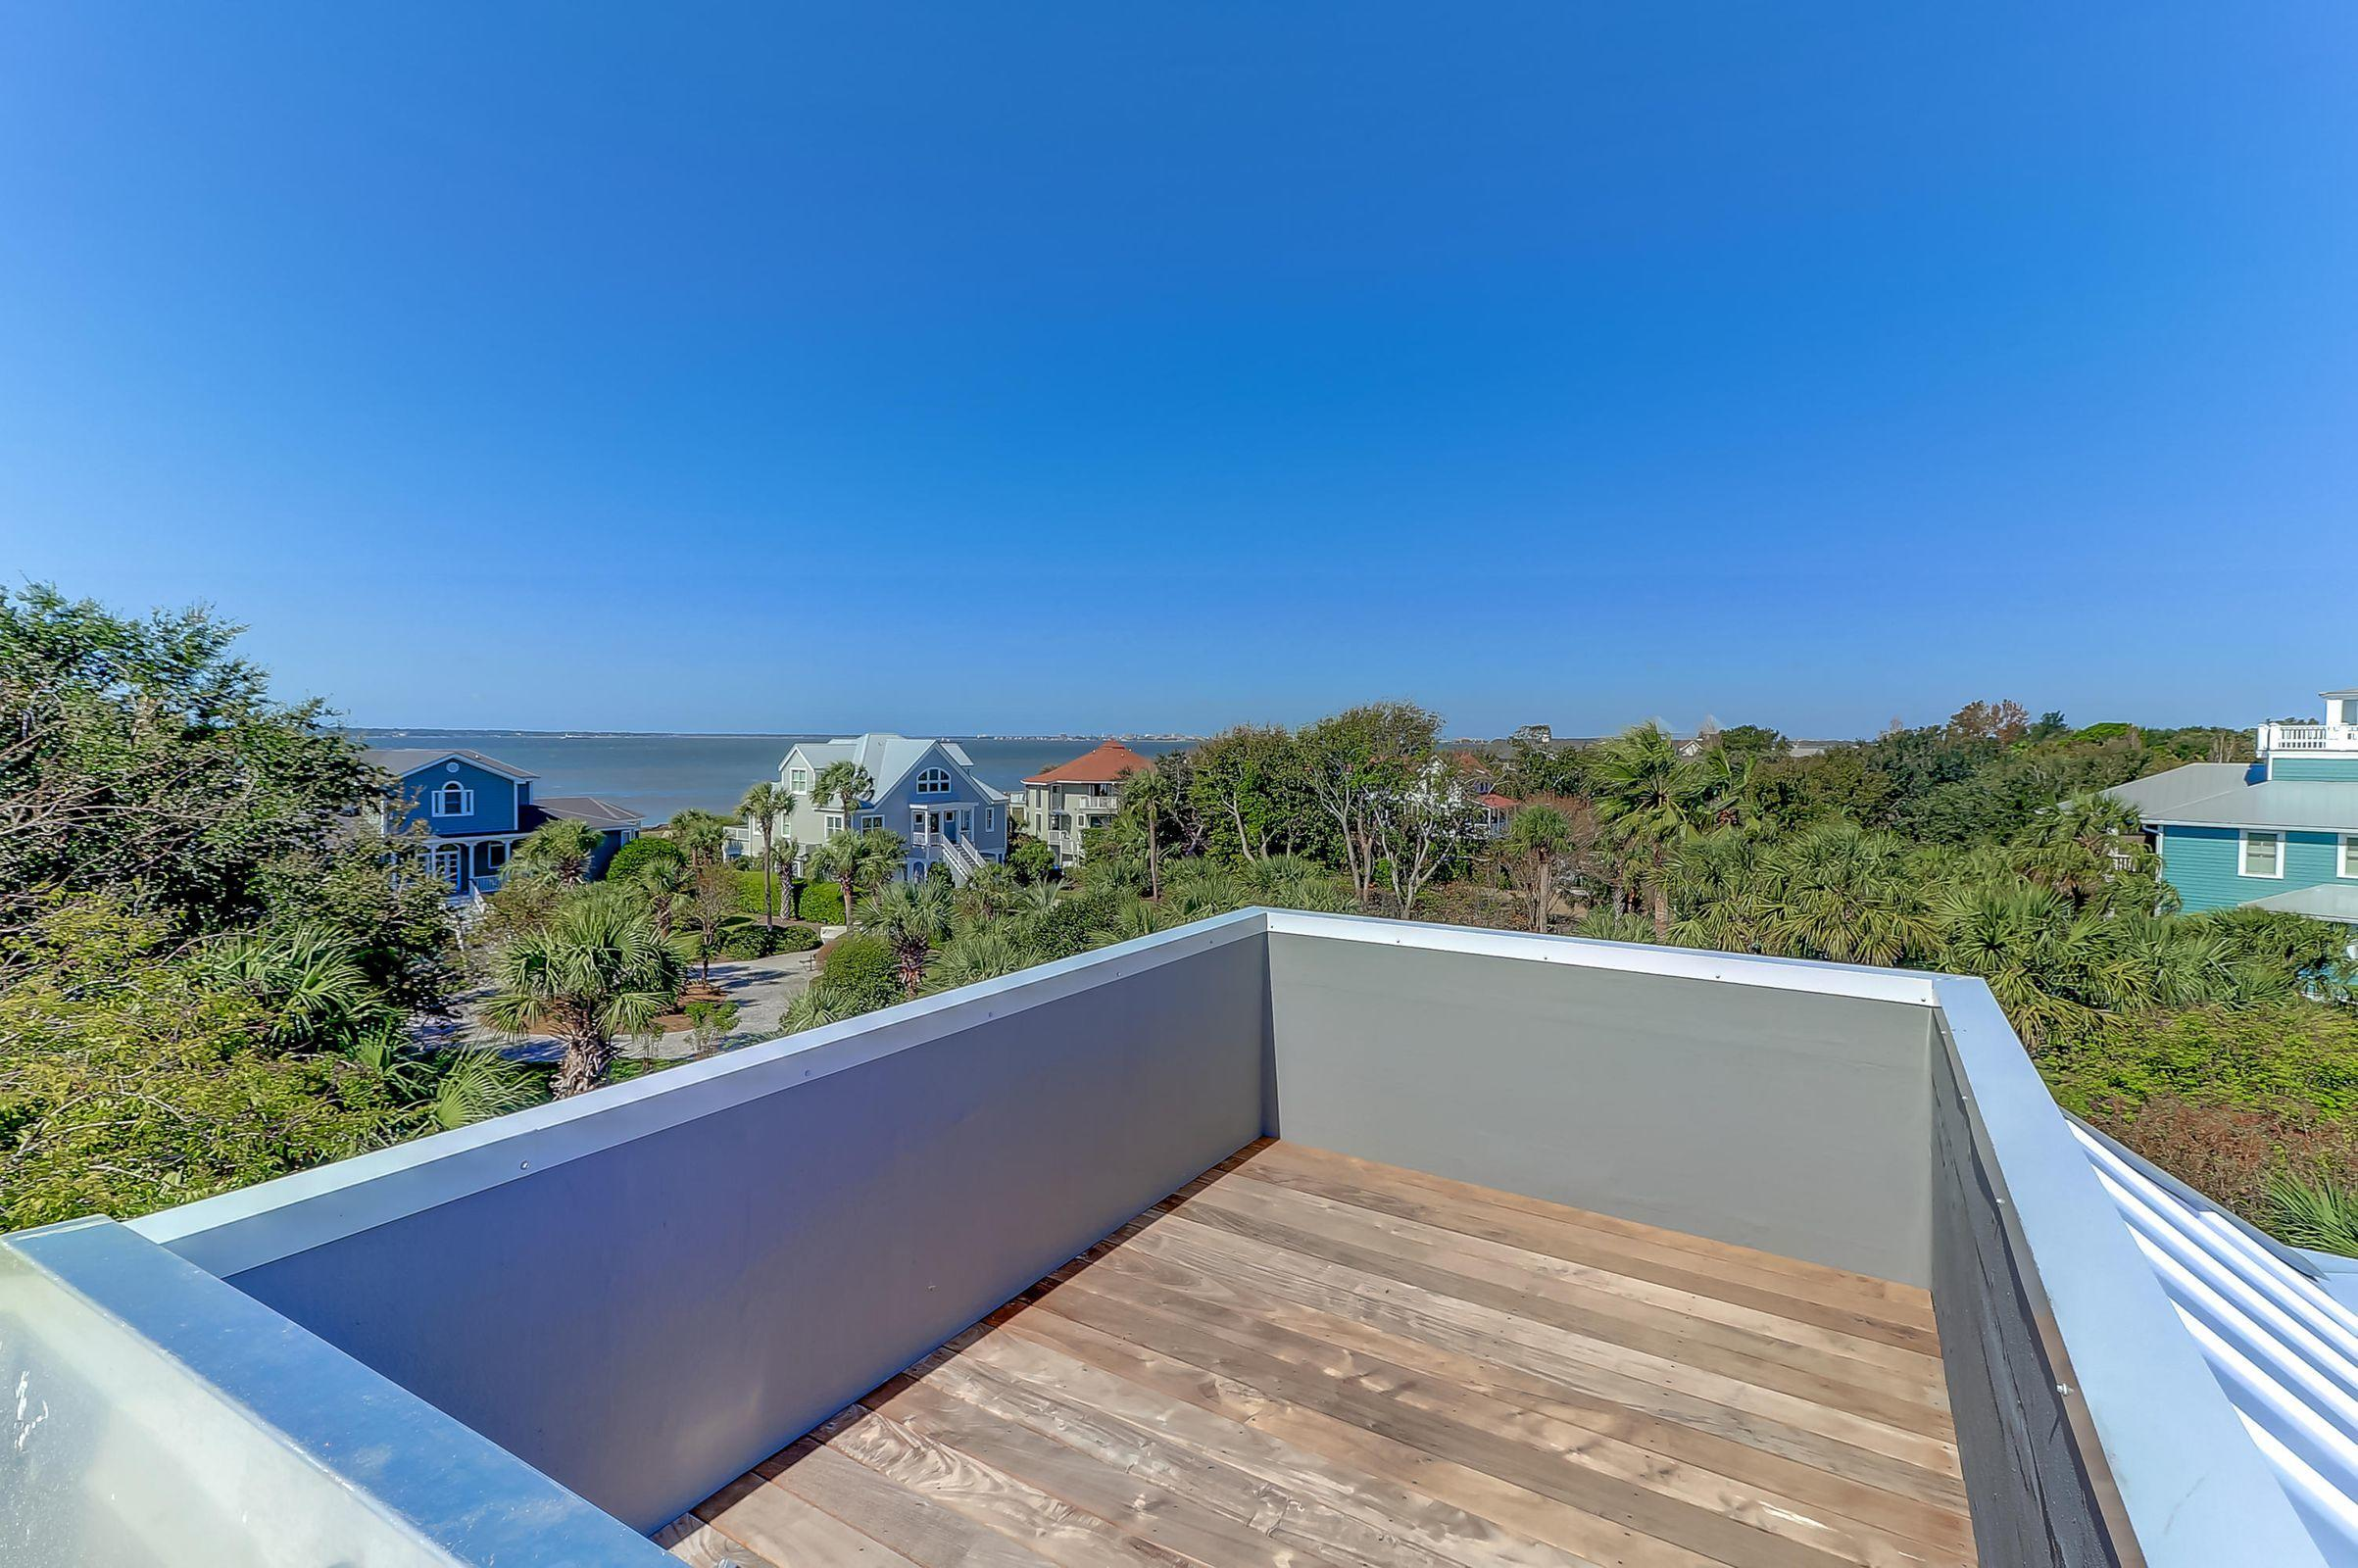 Sullivans Island Homes For Sale - 918 Middle, Sullivans Island, SC - 40